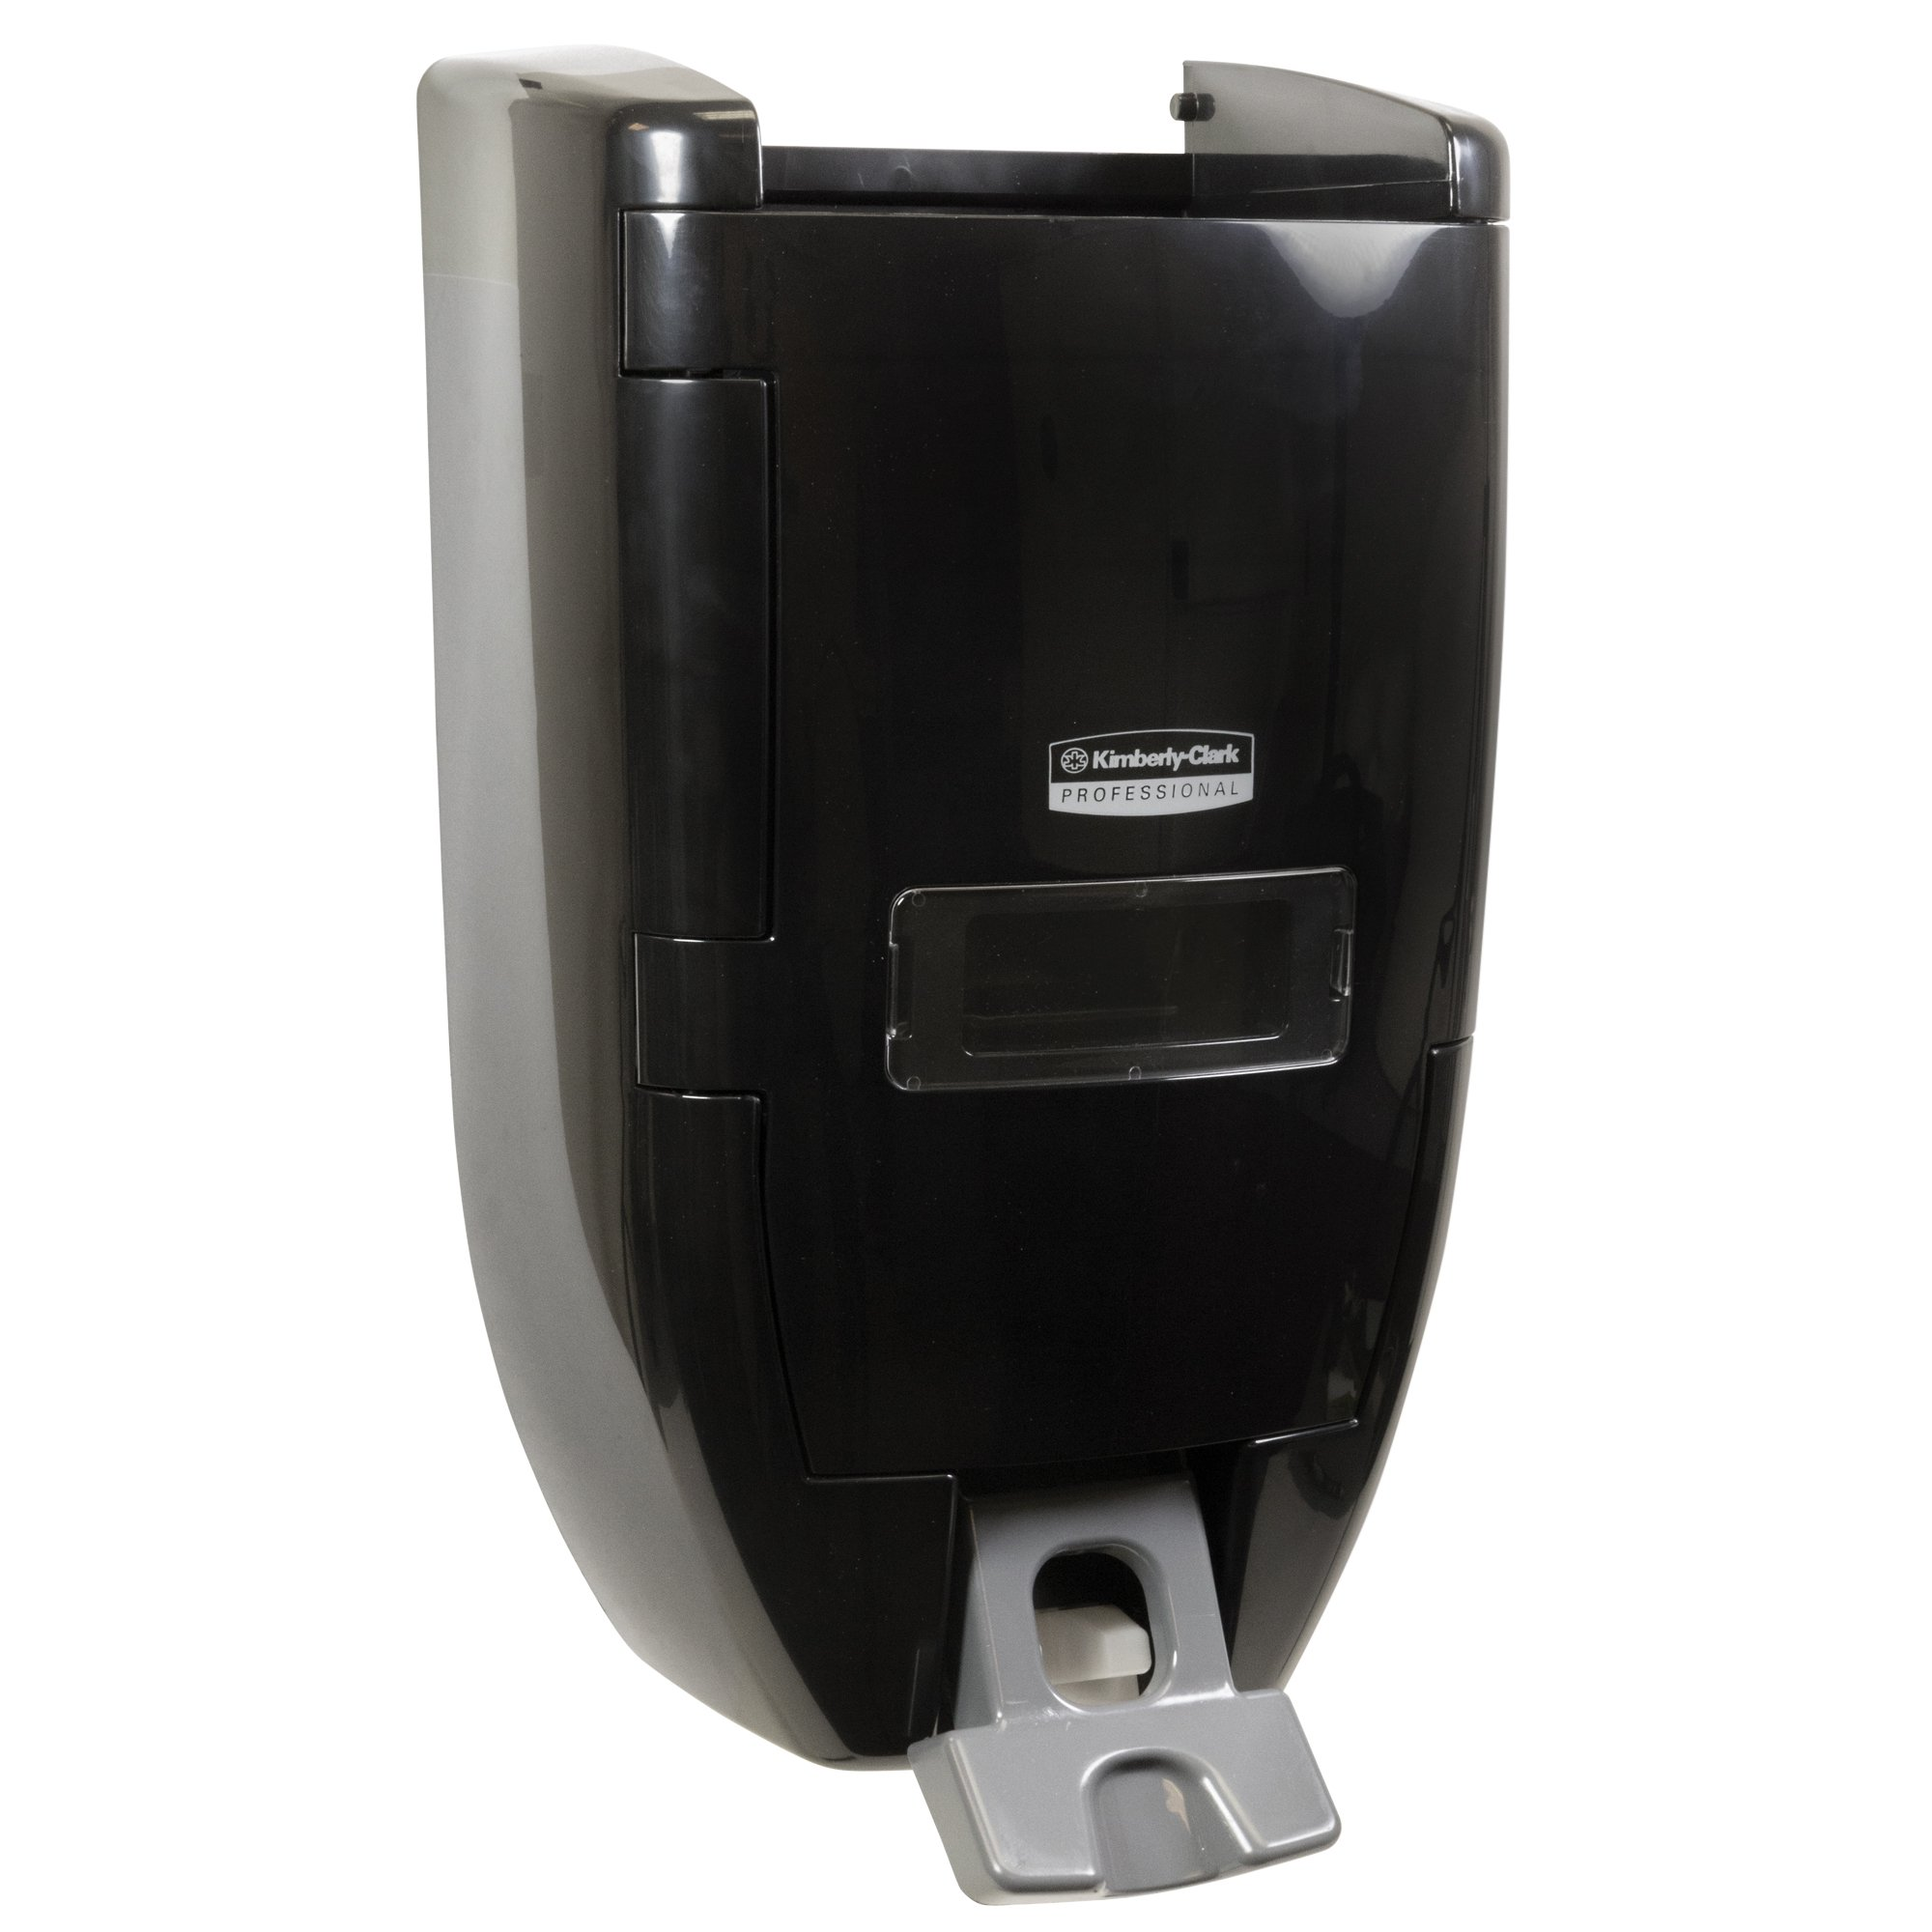 "Kimberly Clark Professional Sani-Tuff Push Soap Dispenser (92013), 10.8"" x 7.0"" x 17.8"", 3.5 or 8 Liter Soap Refills, Smoke/Black, 1 / Case"